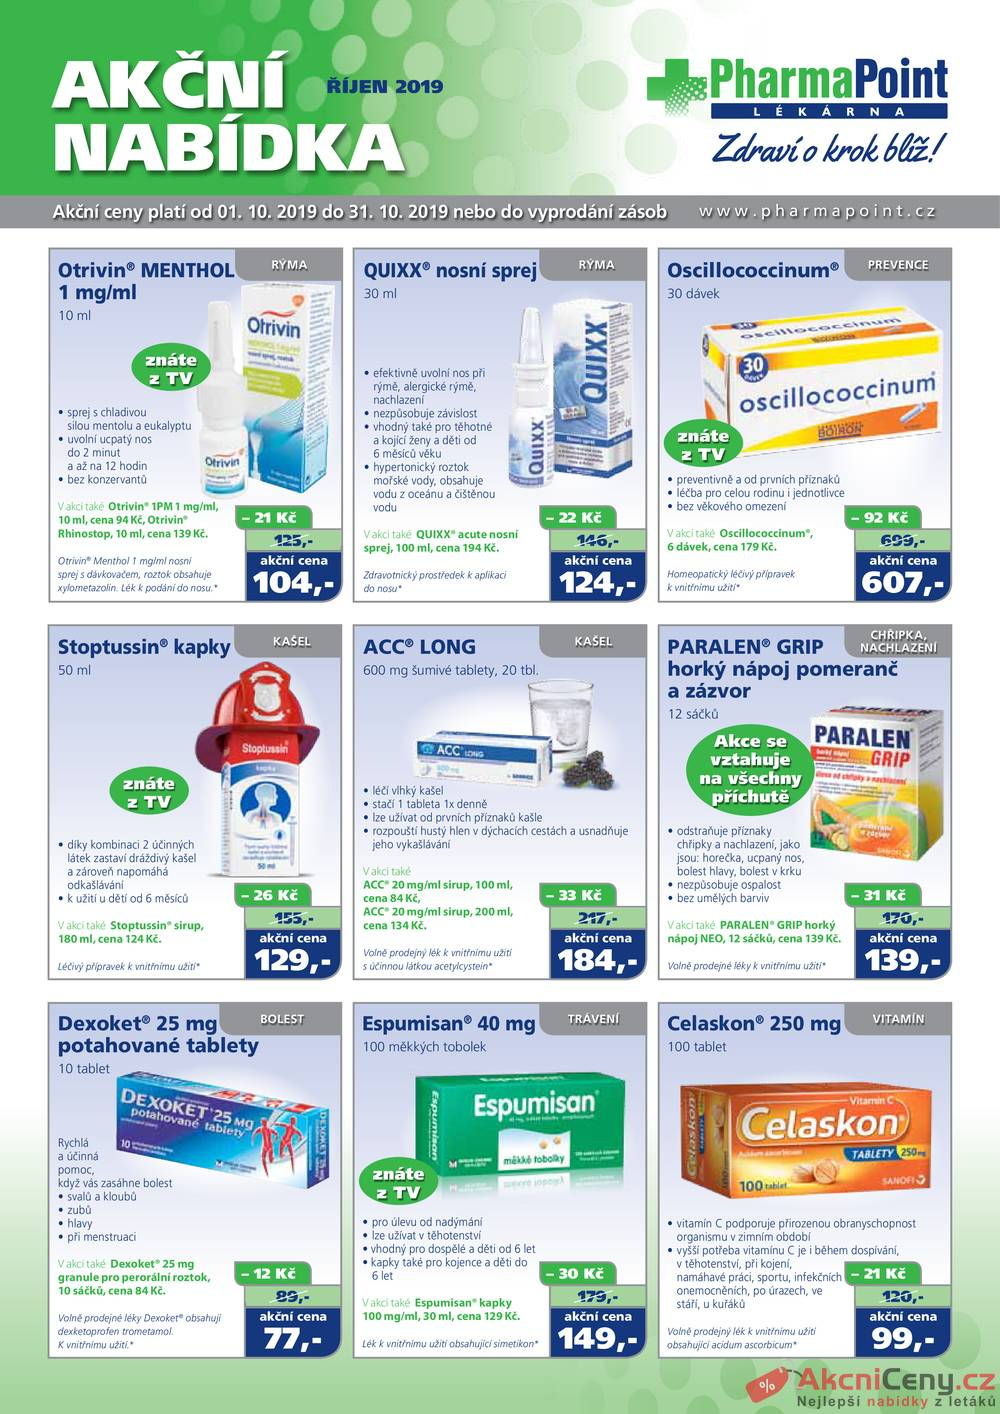 Leták PharmaPoint  - Pharma Point bez přepisu od 1.10. do 31.10.2019 - strana 1